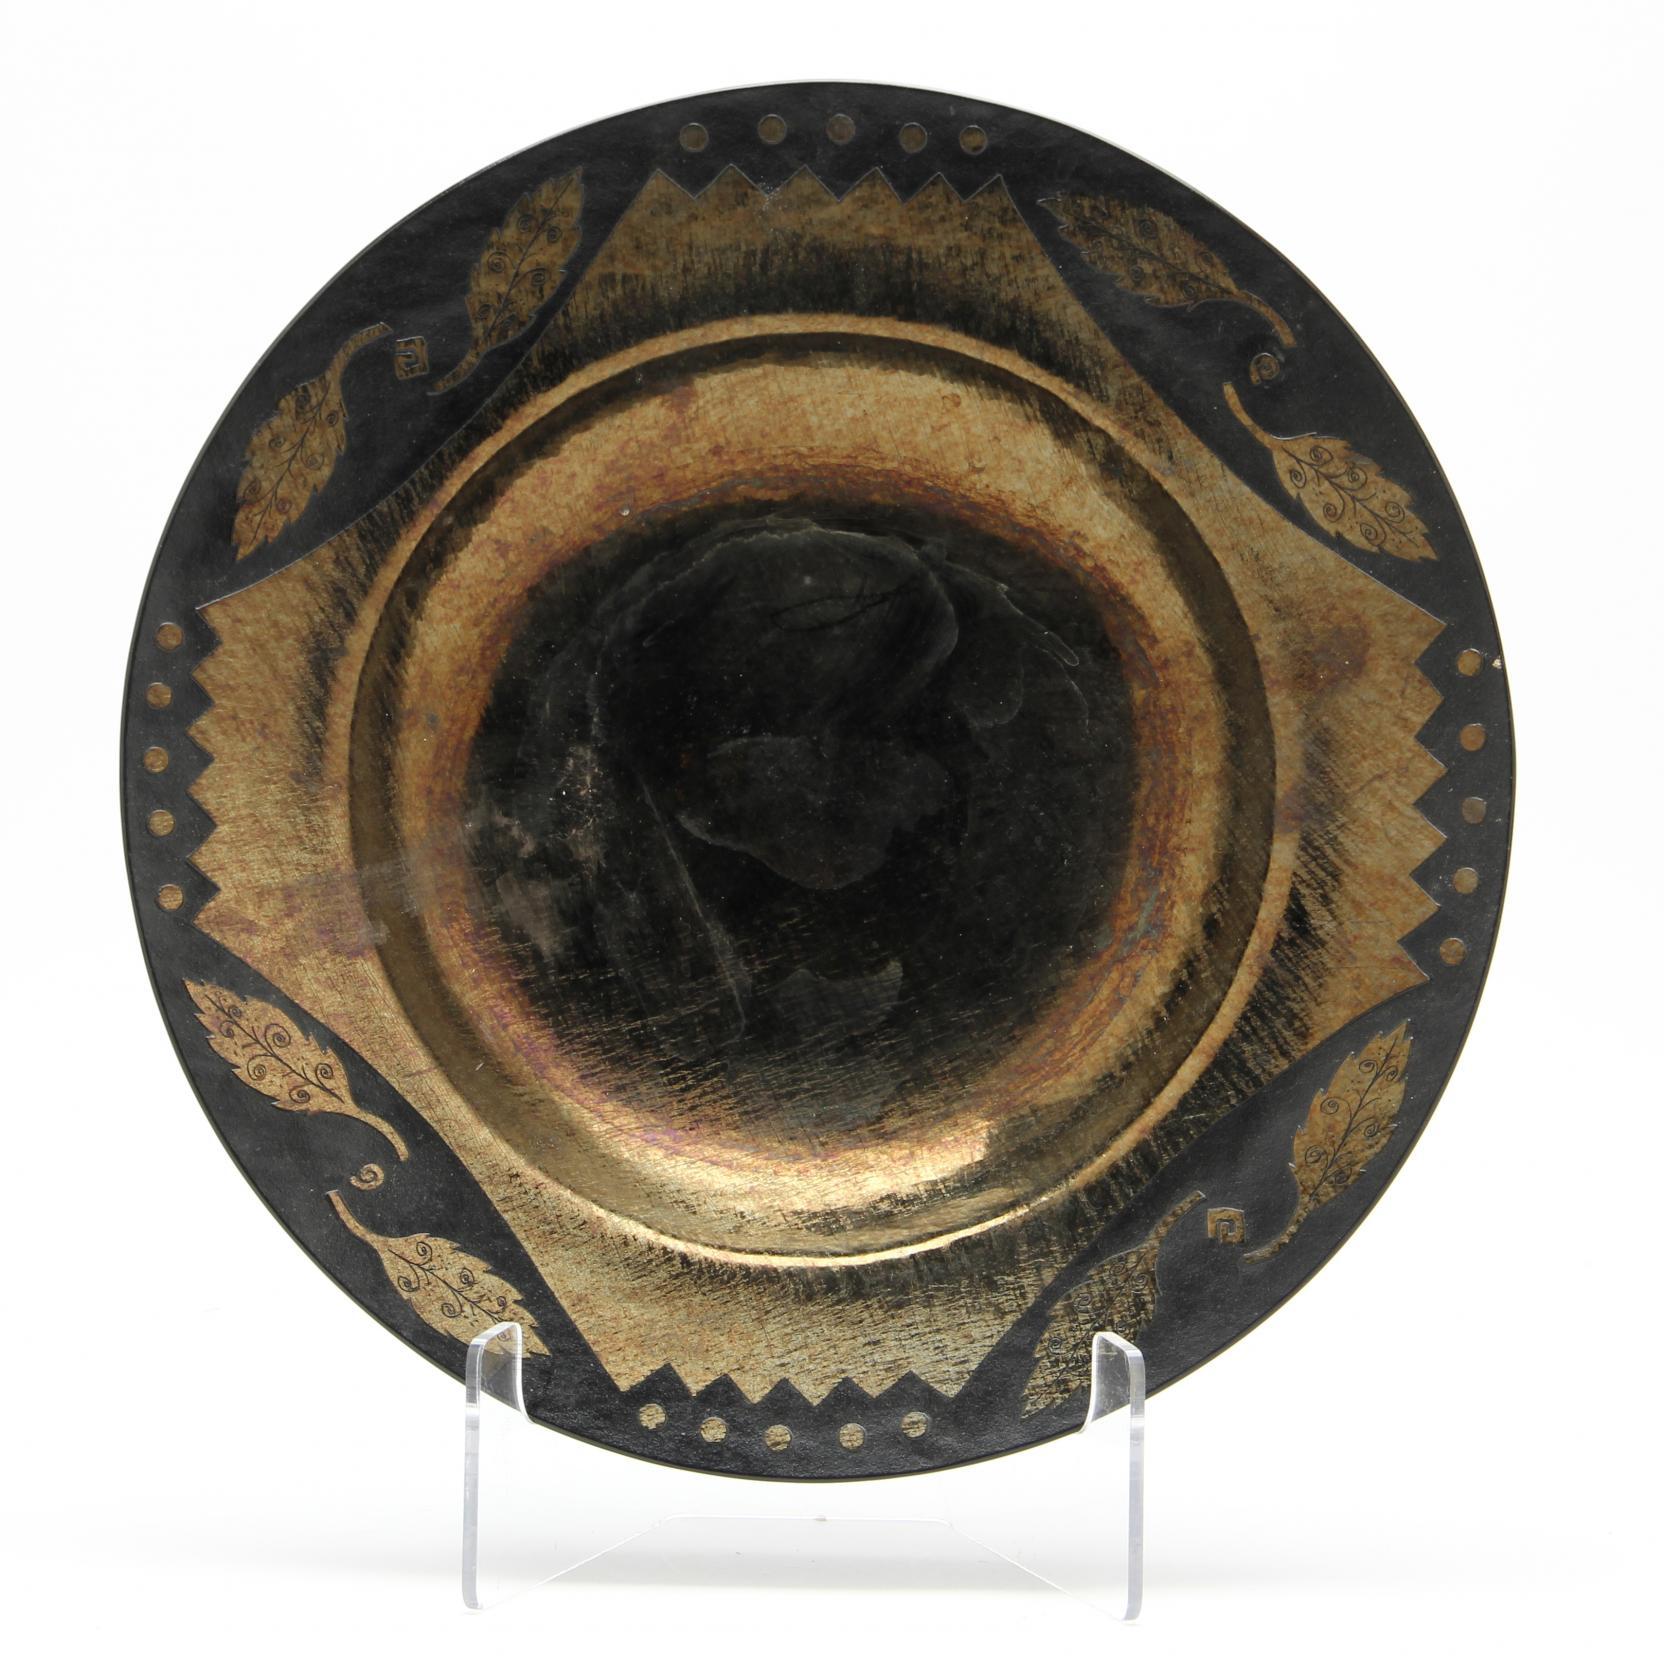 lynn-latimer-easthampton-ma-fused-art-glass-center-bowl